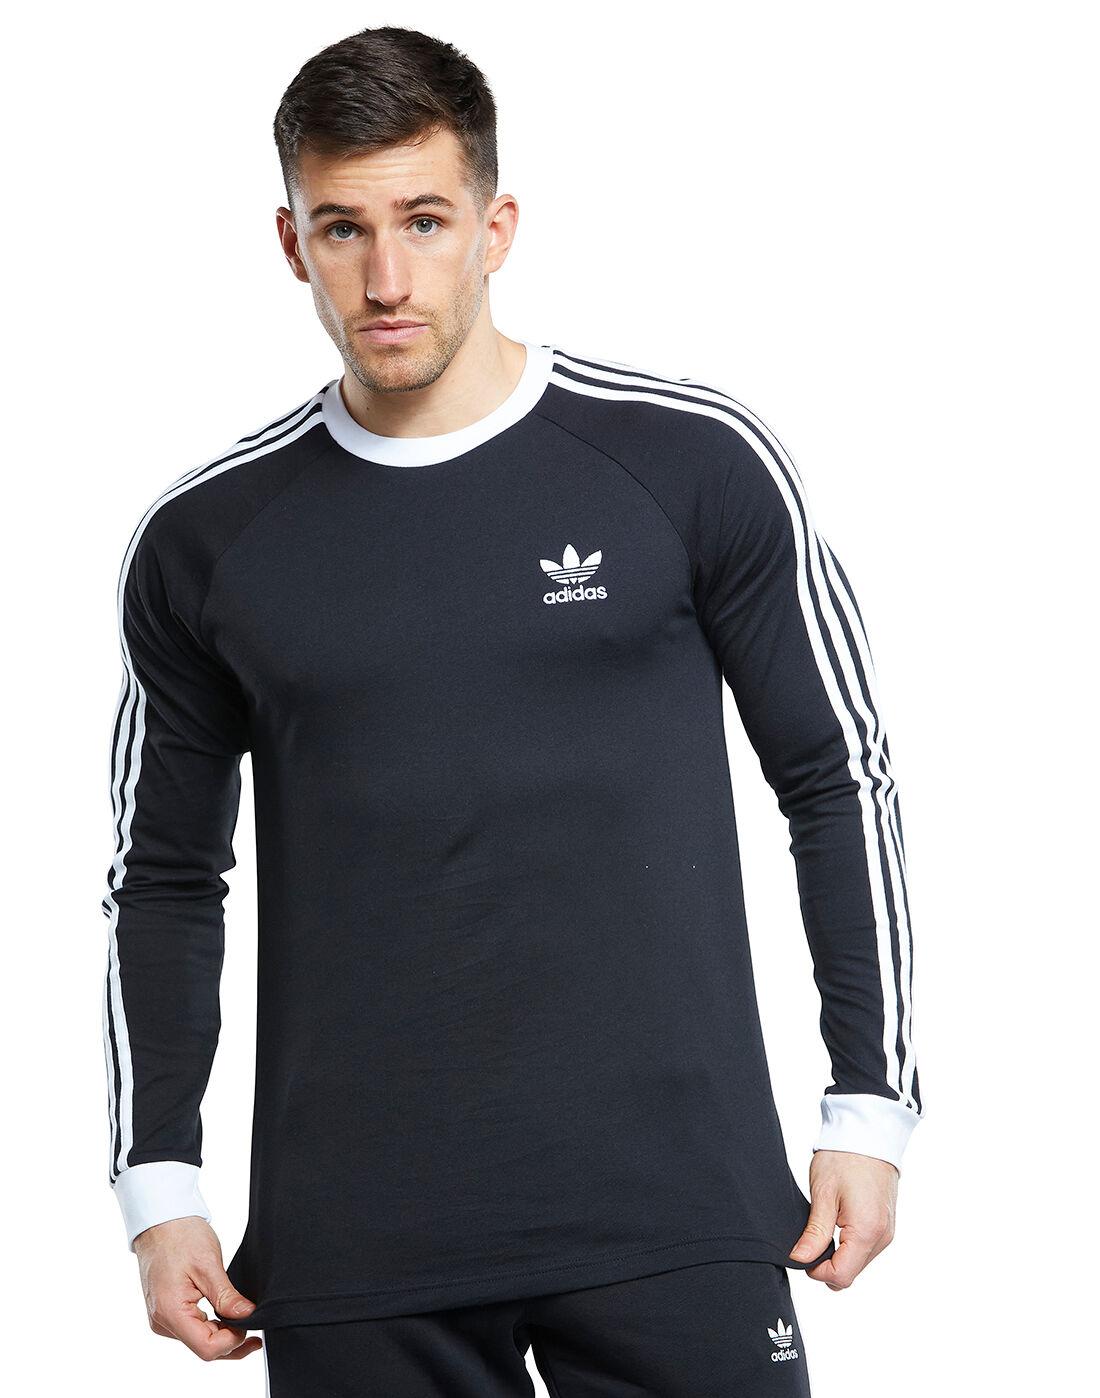 adidas Originals Mens 3-Stripes Long Sleeve T-Shirt - Black ...